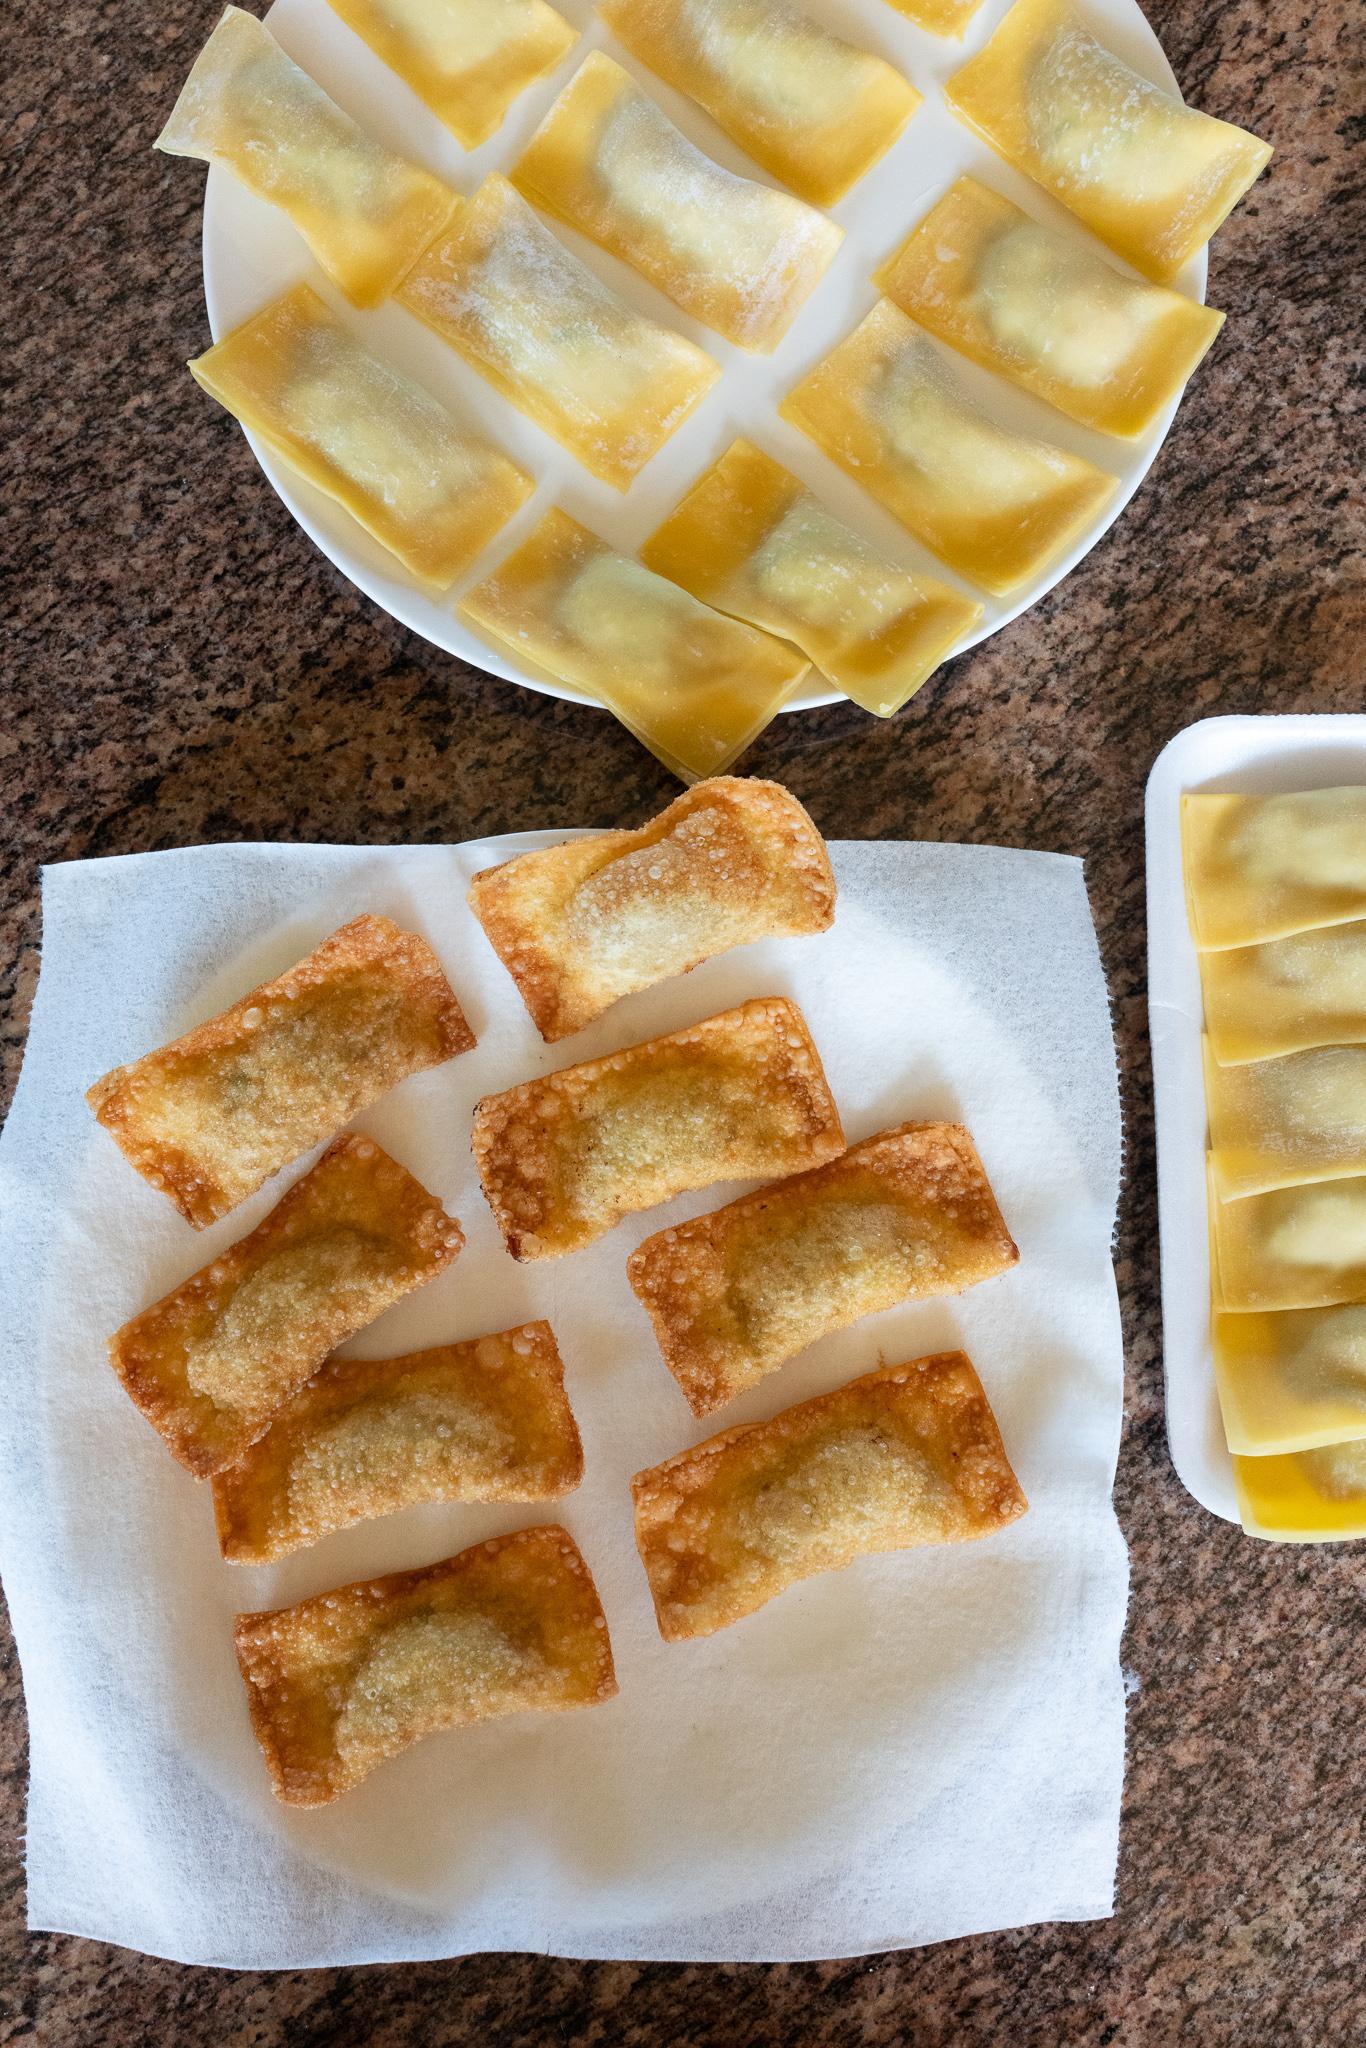 A batch of fresh fried Gau Gee on a plate. A batch of just folded Gau Gee (not yet fried) on another plate.